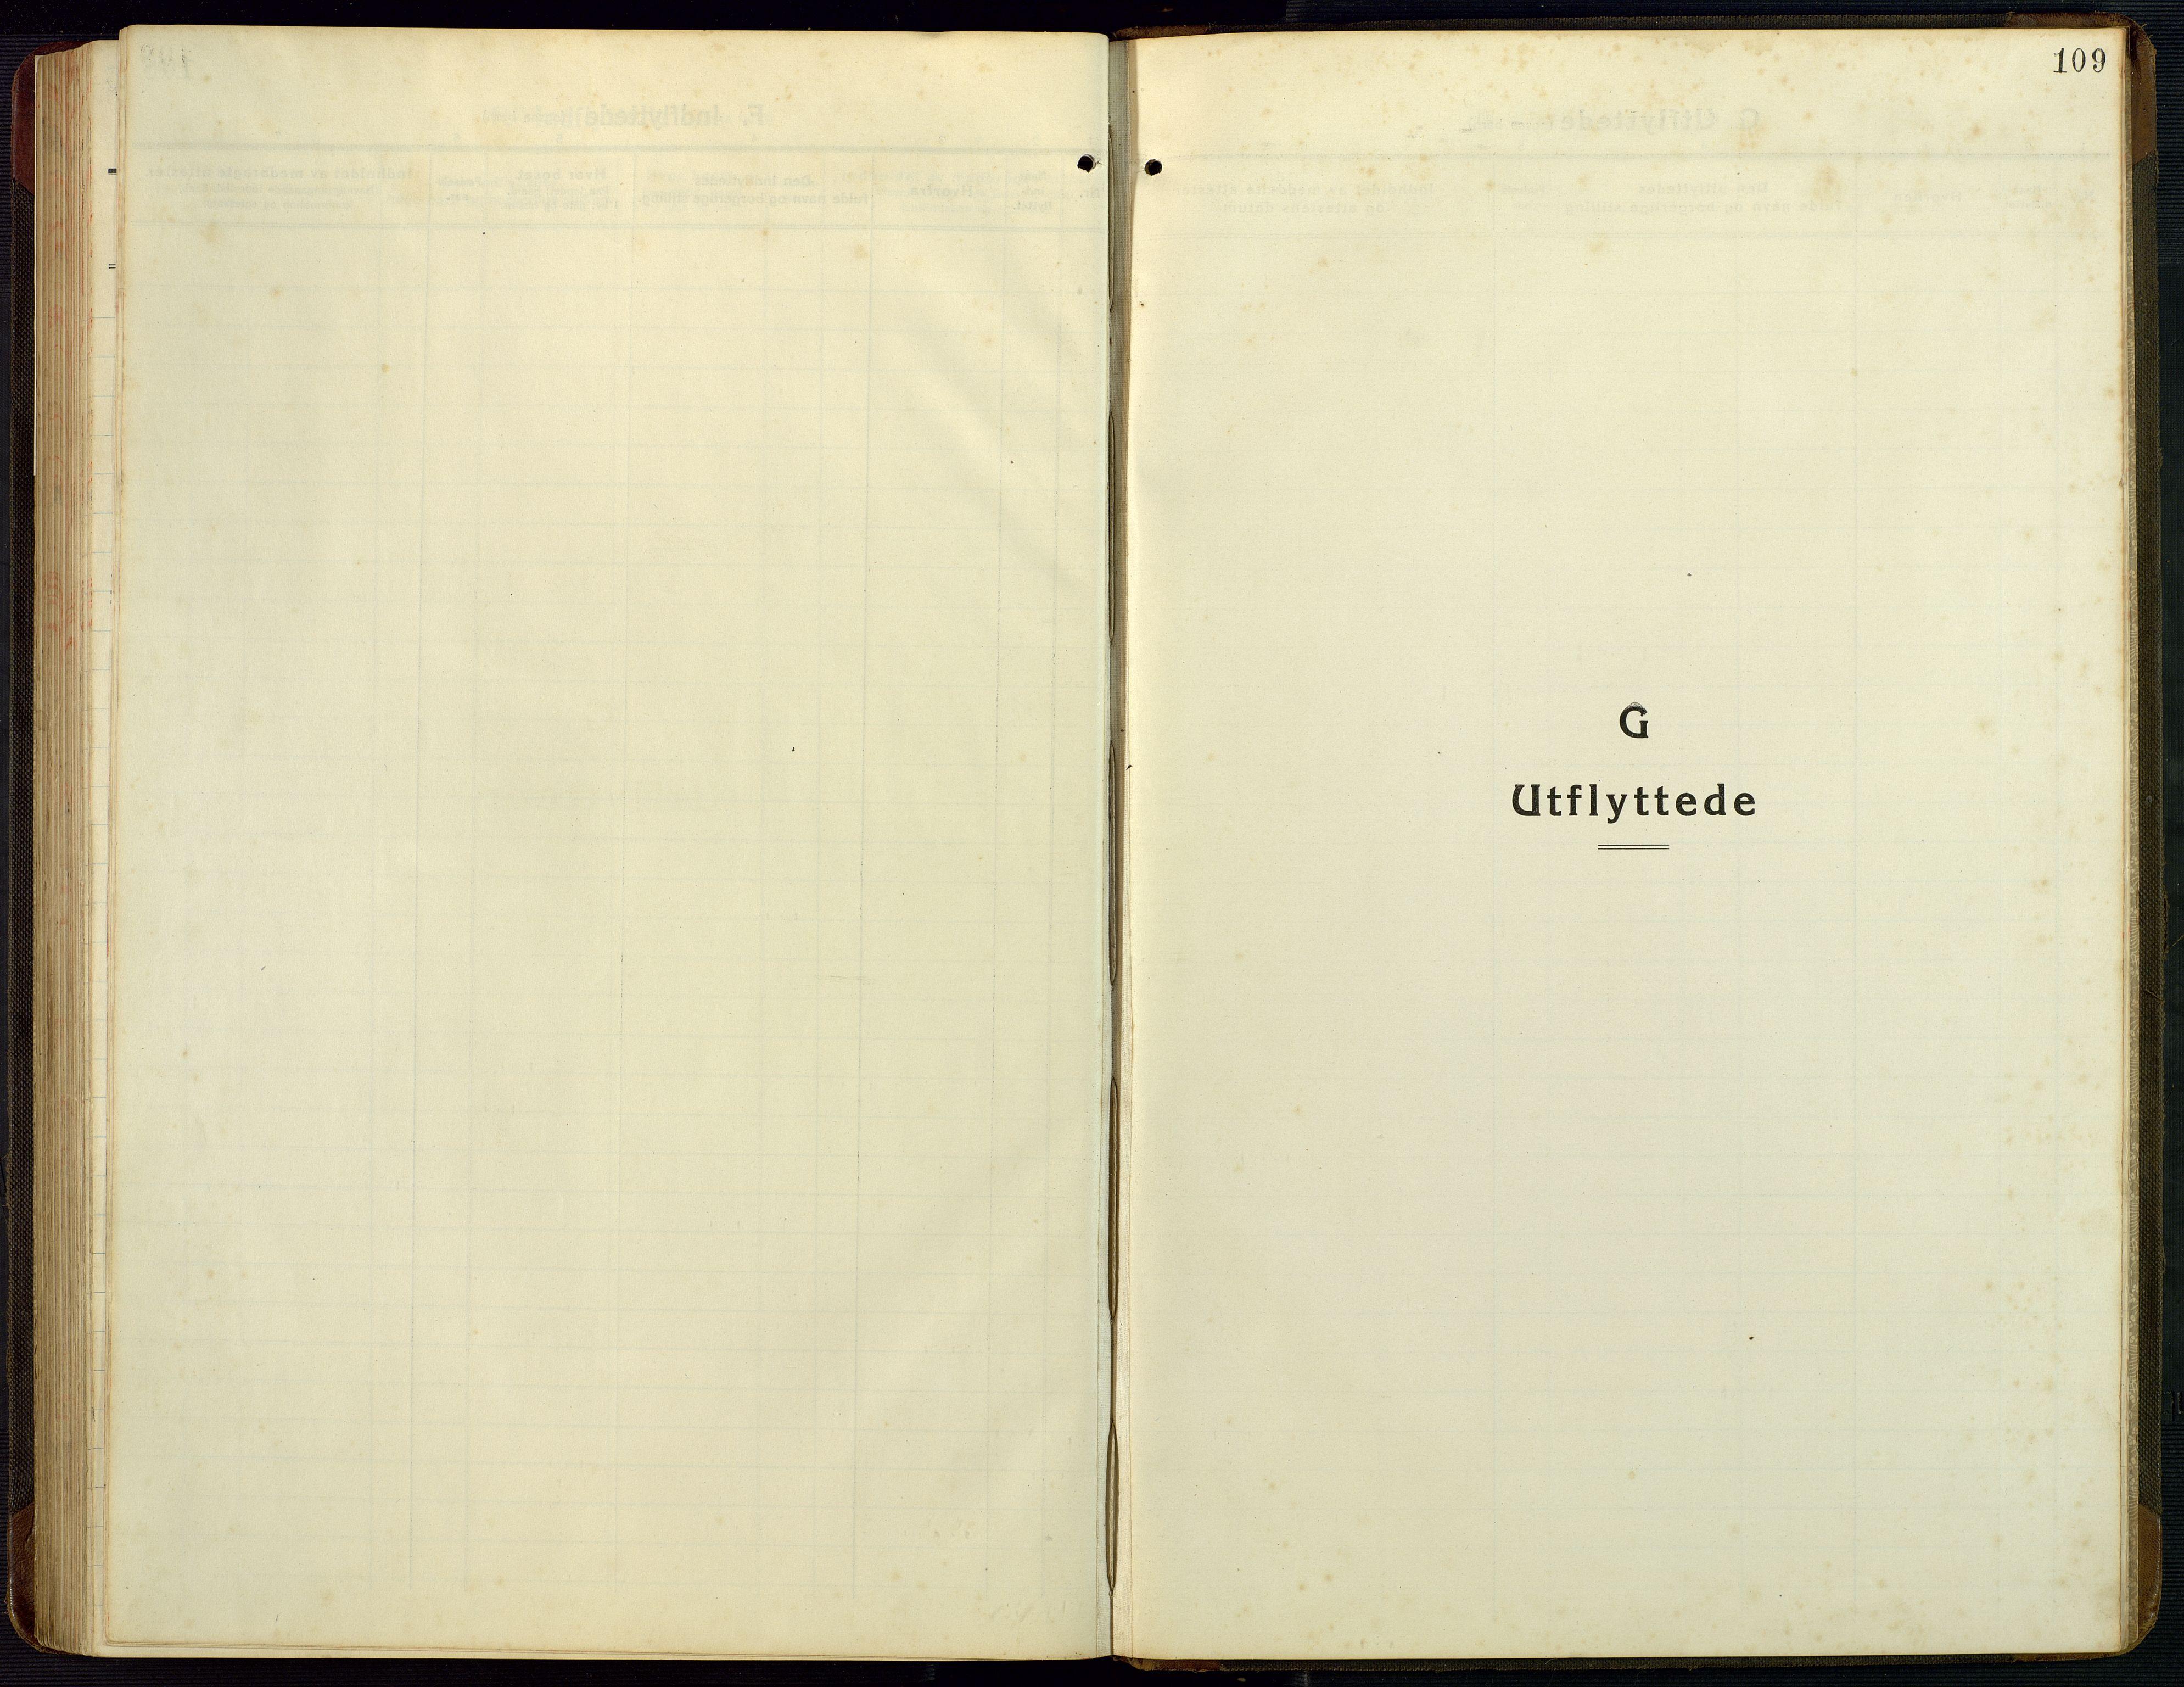 SAK, Bygland sokneprestkontor, F/Fb/Fba/L0003: Klokkerbok nr. B 3, 1920-1974, s. 109